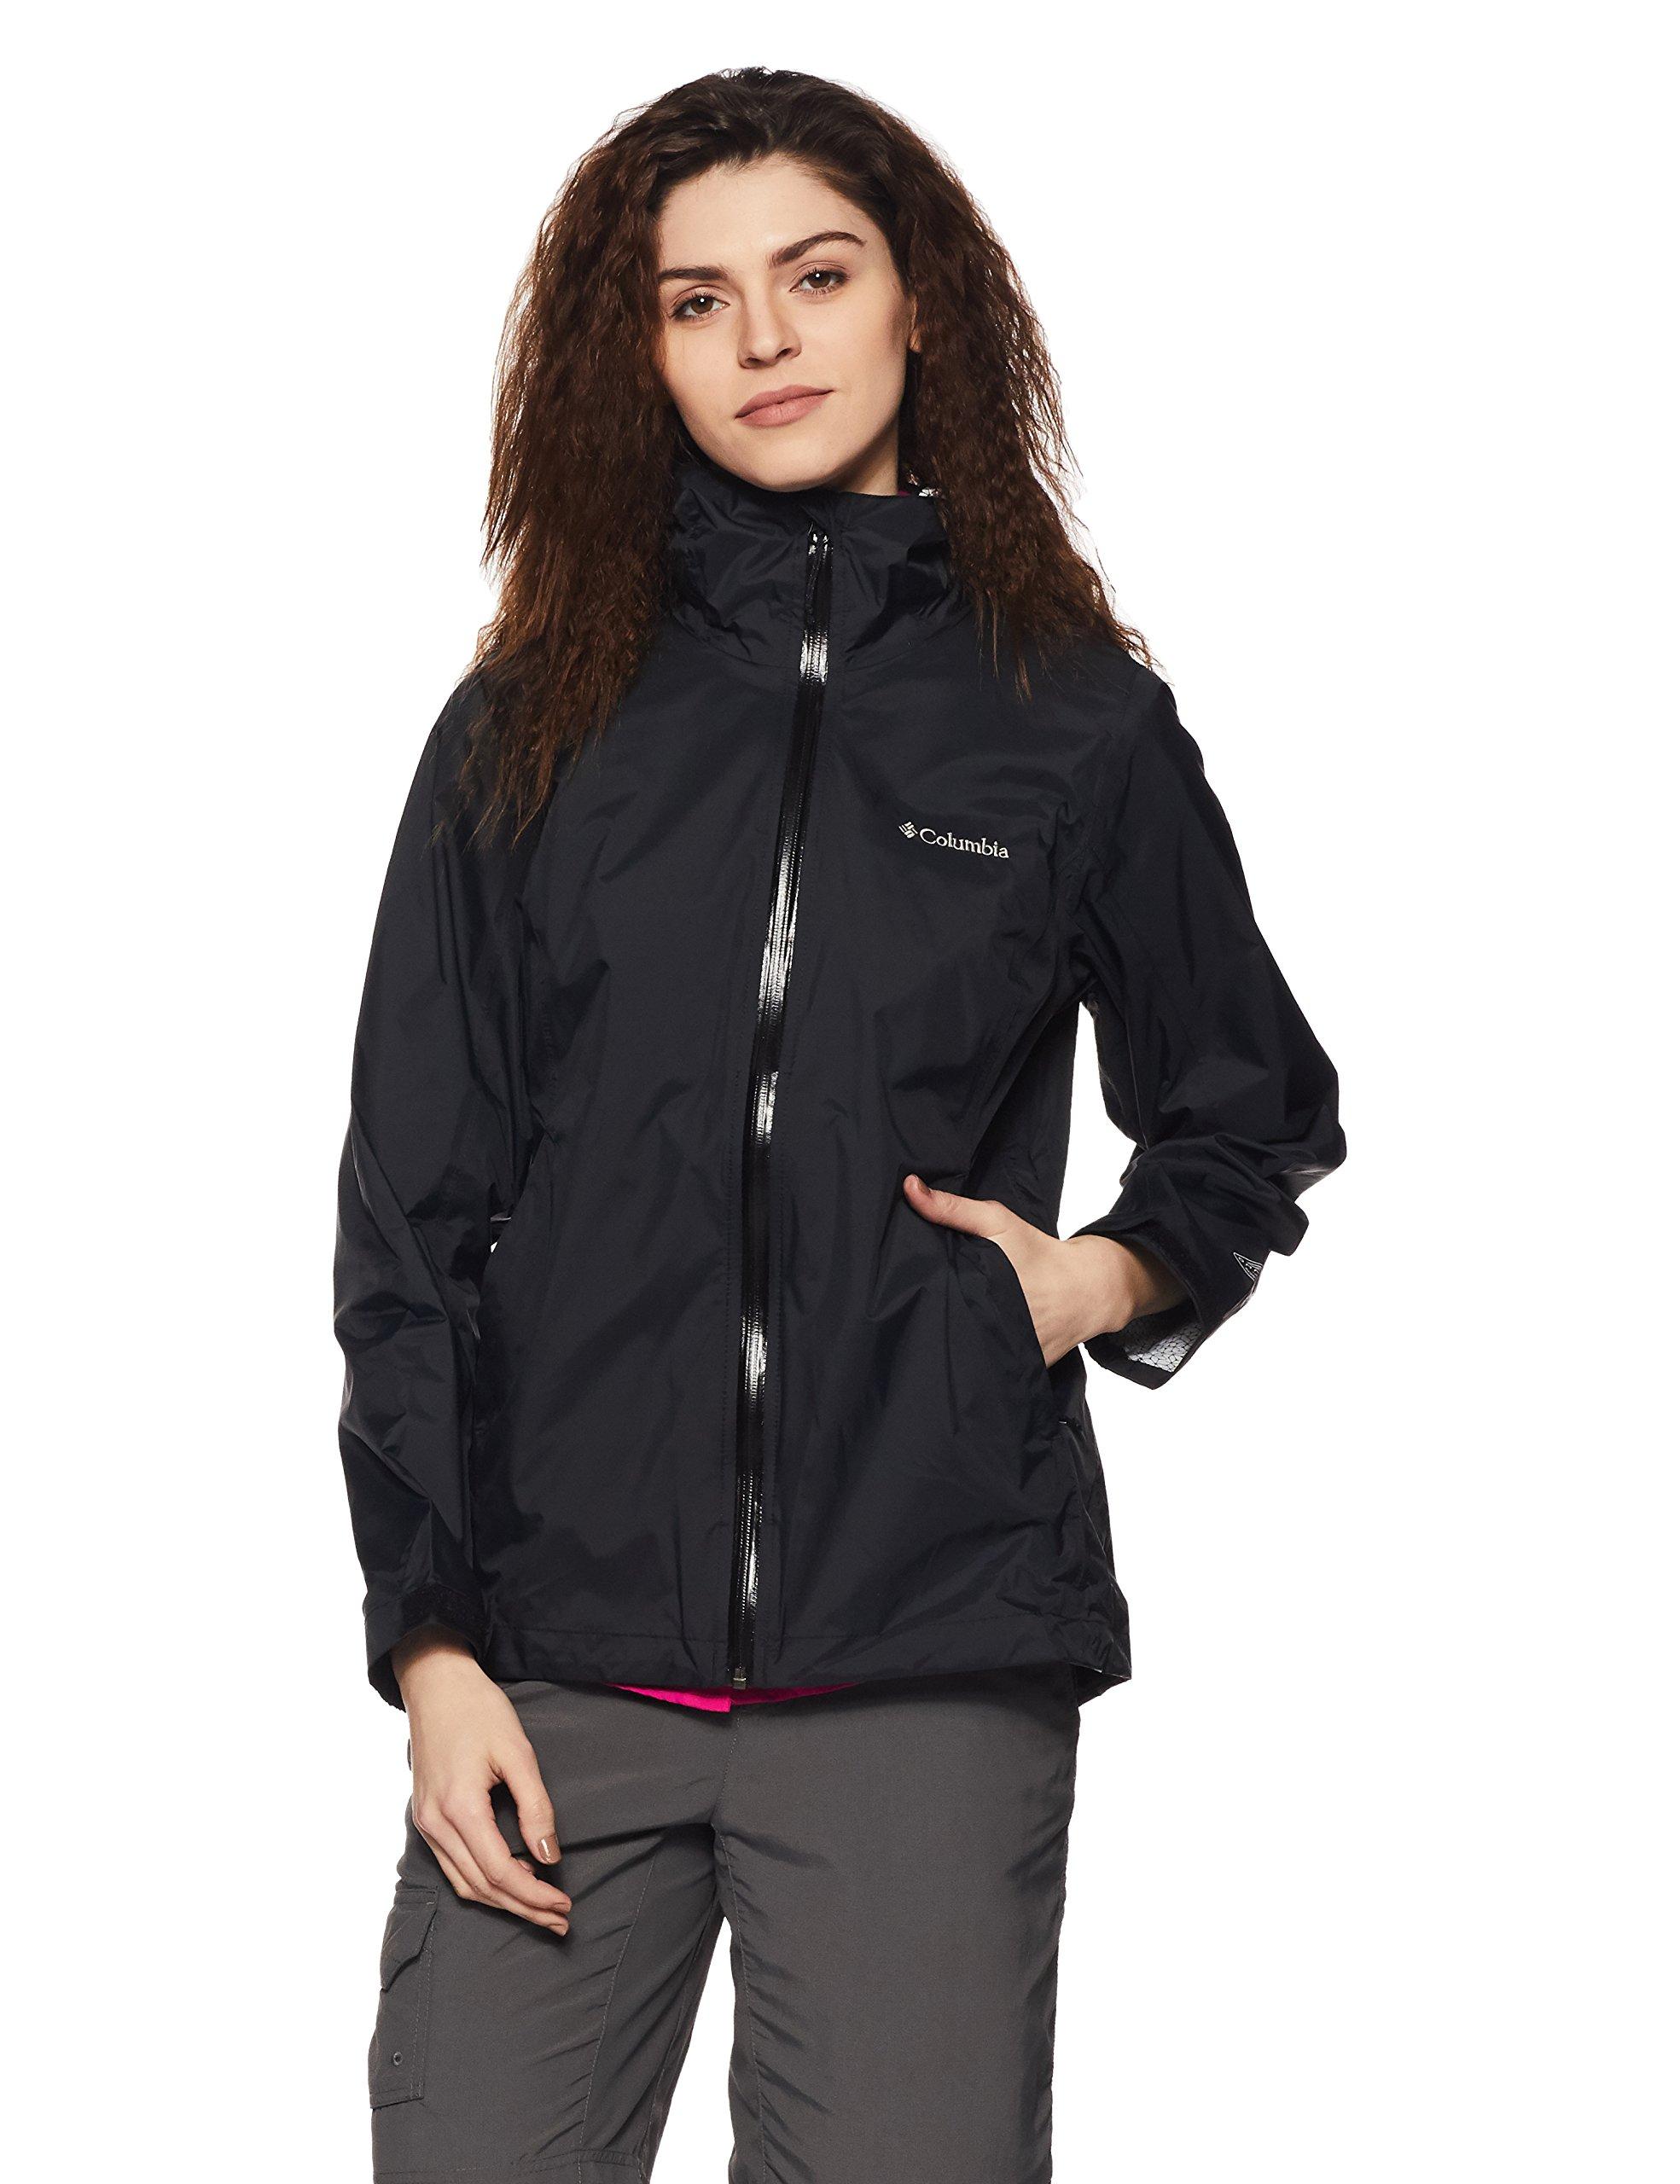 Columbia Women's Evapouration Jacket, Black, X-Small